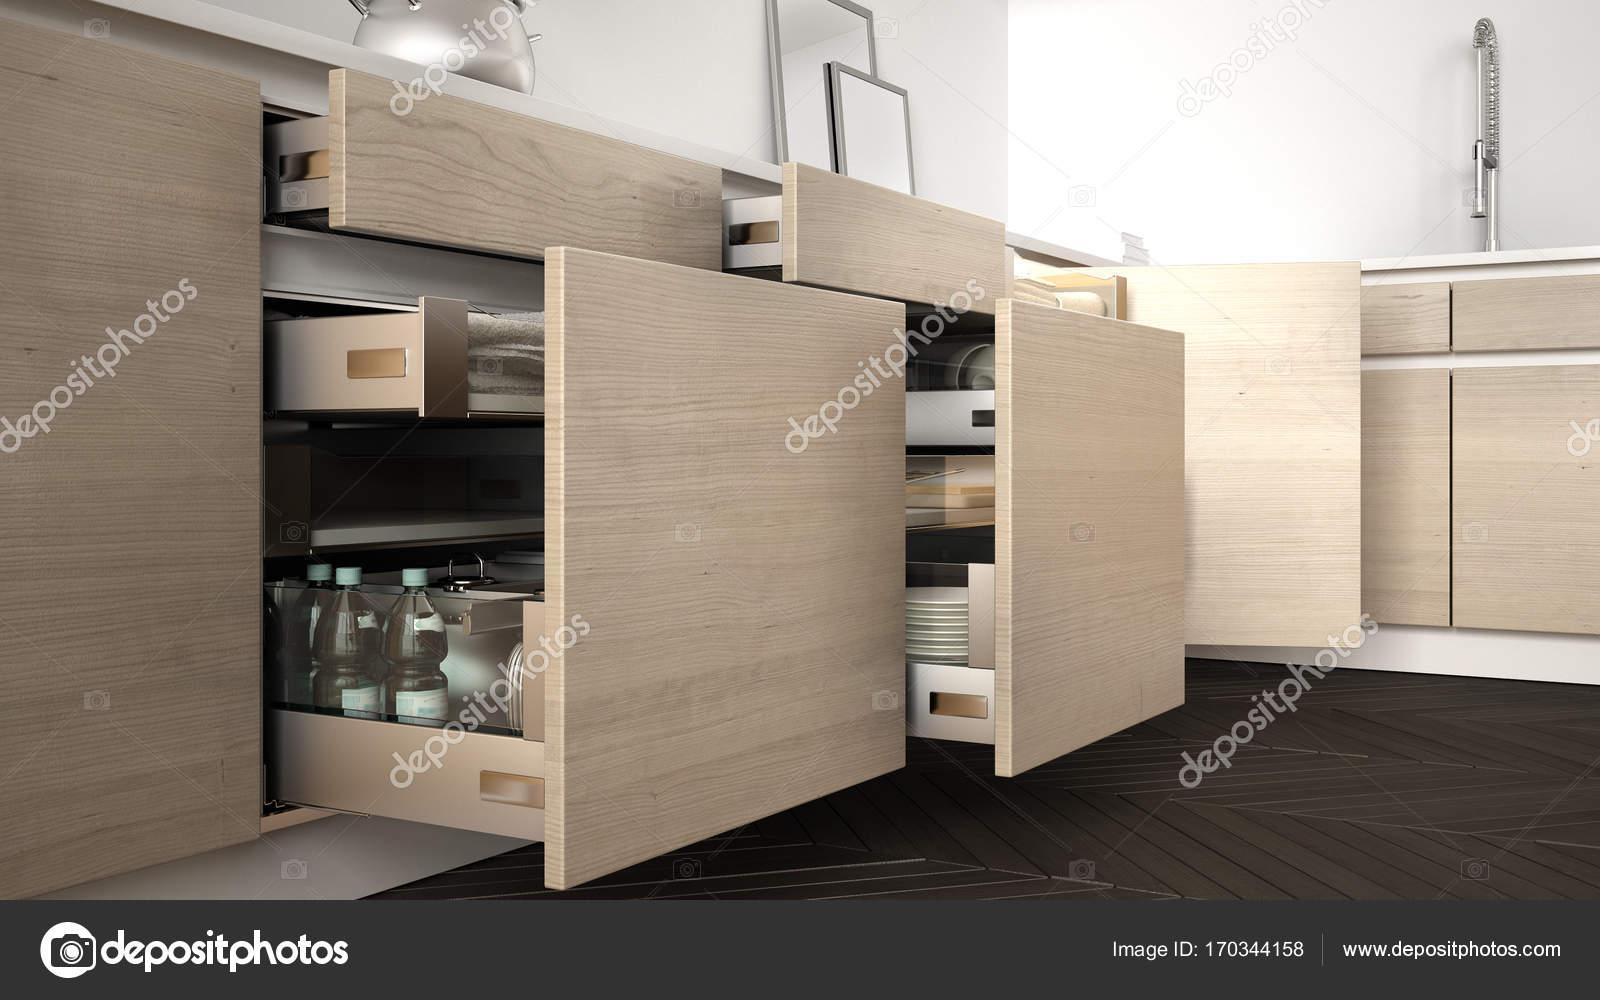 Grey Keuken Houten : Moderne keuken houten laden met accessoires binnen s geopend